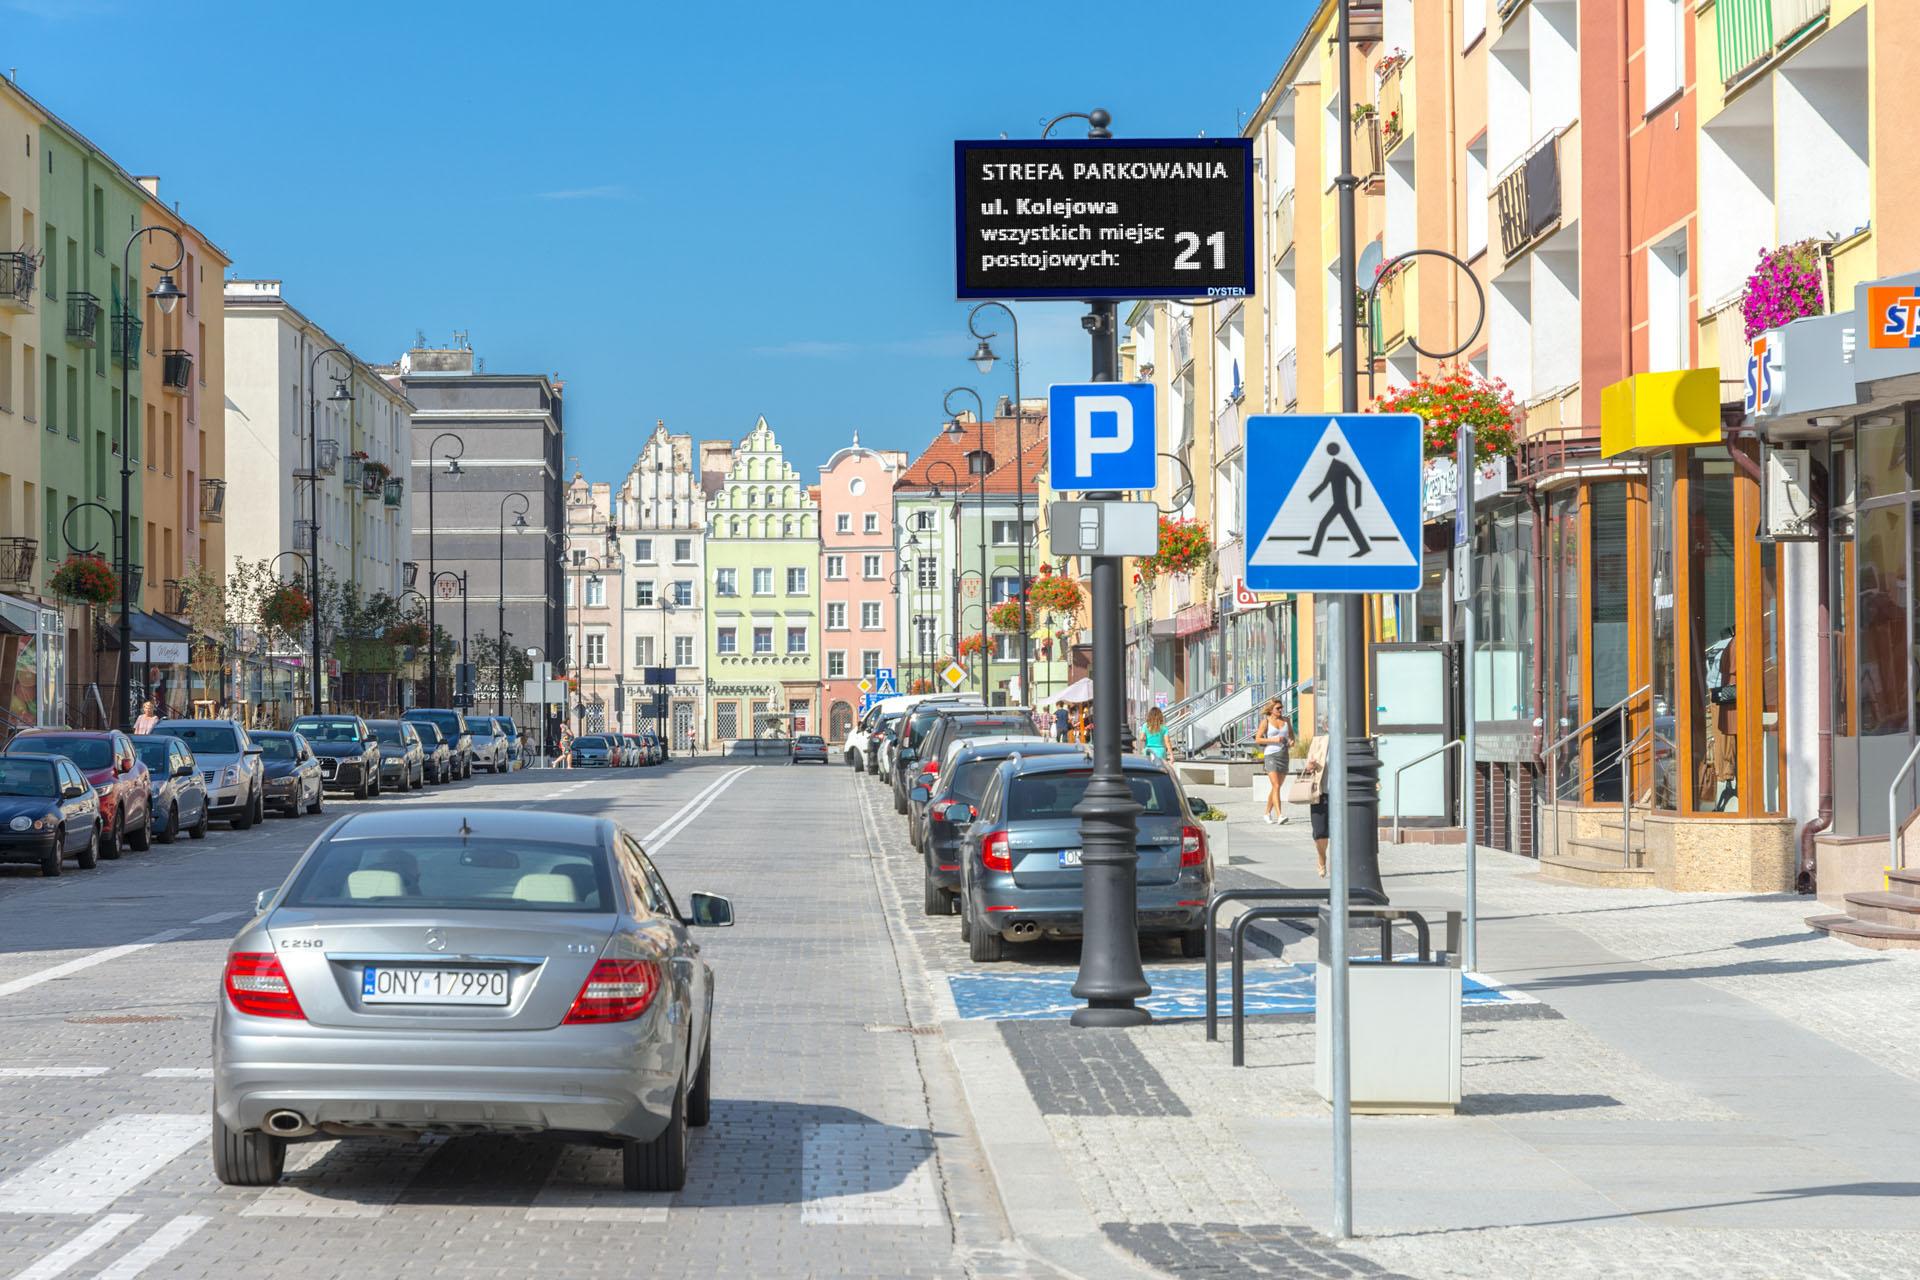 VMS ZZT Dysten - nowoczesne Znaki Zmiennej Treści, modern LED RGB Variable Message Signs, Nysa 2020, starówka, the old town